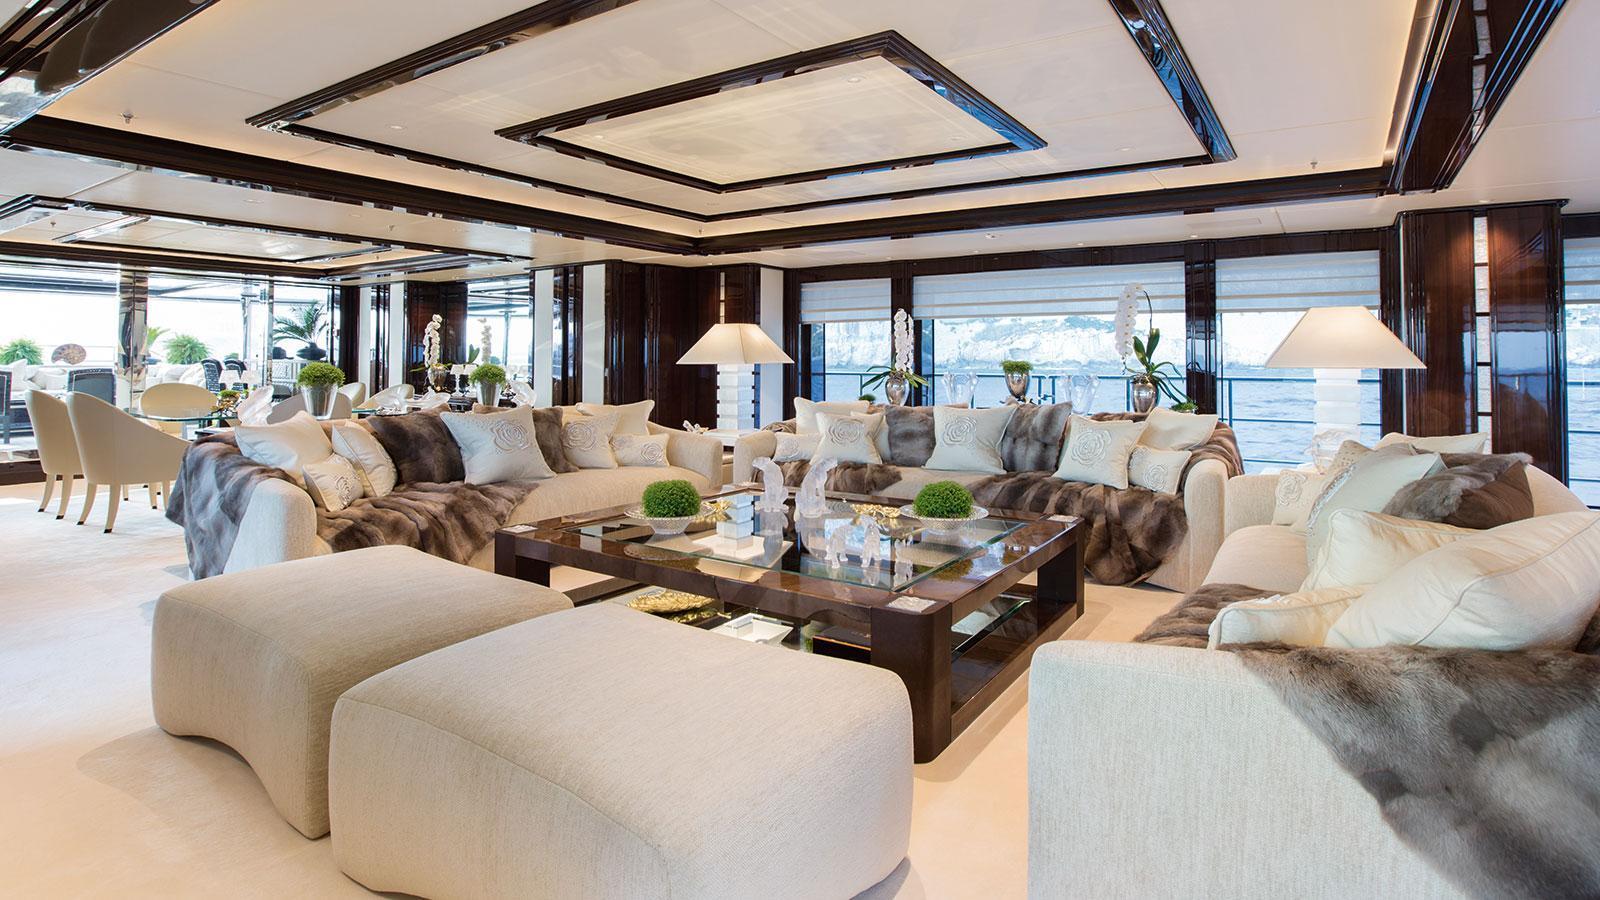 illusion-v-motor-yacht-benetti-2014-58m-saloon